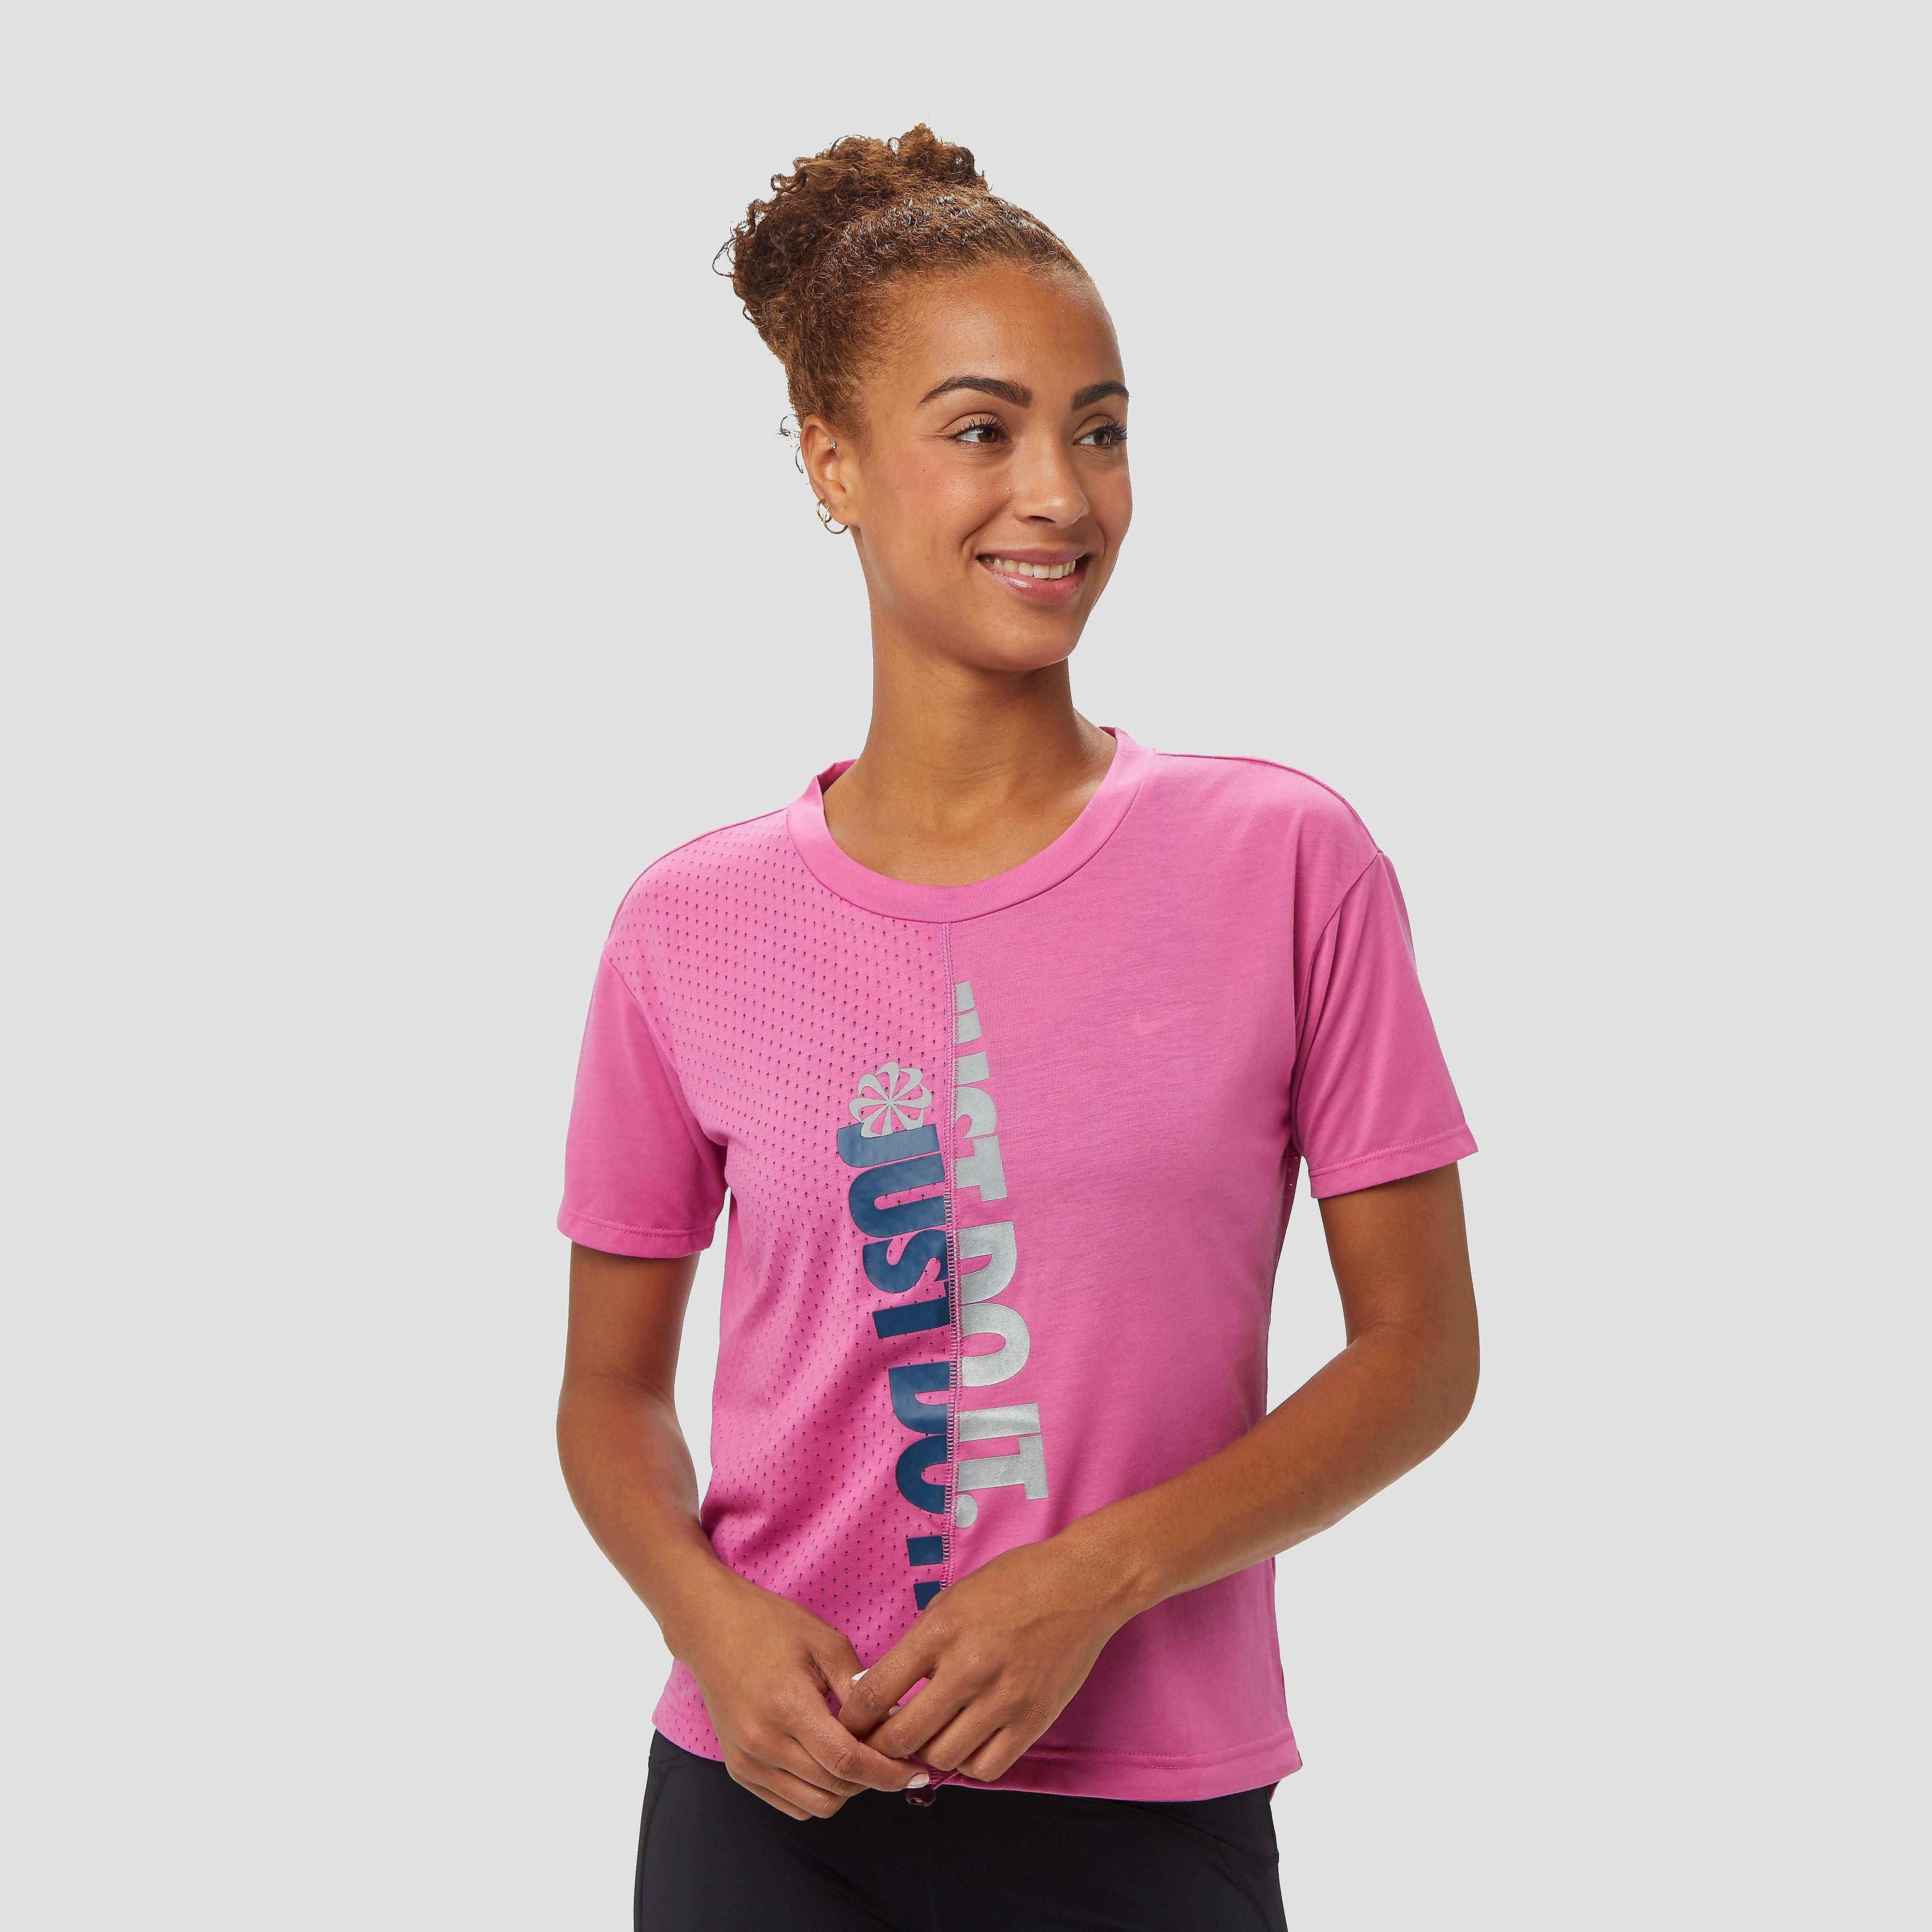 NIKE Iconclsh hardloopshirt roze dames Dames